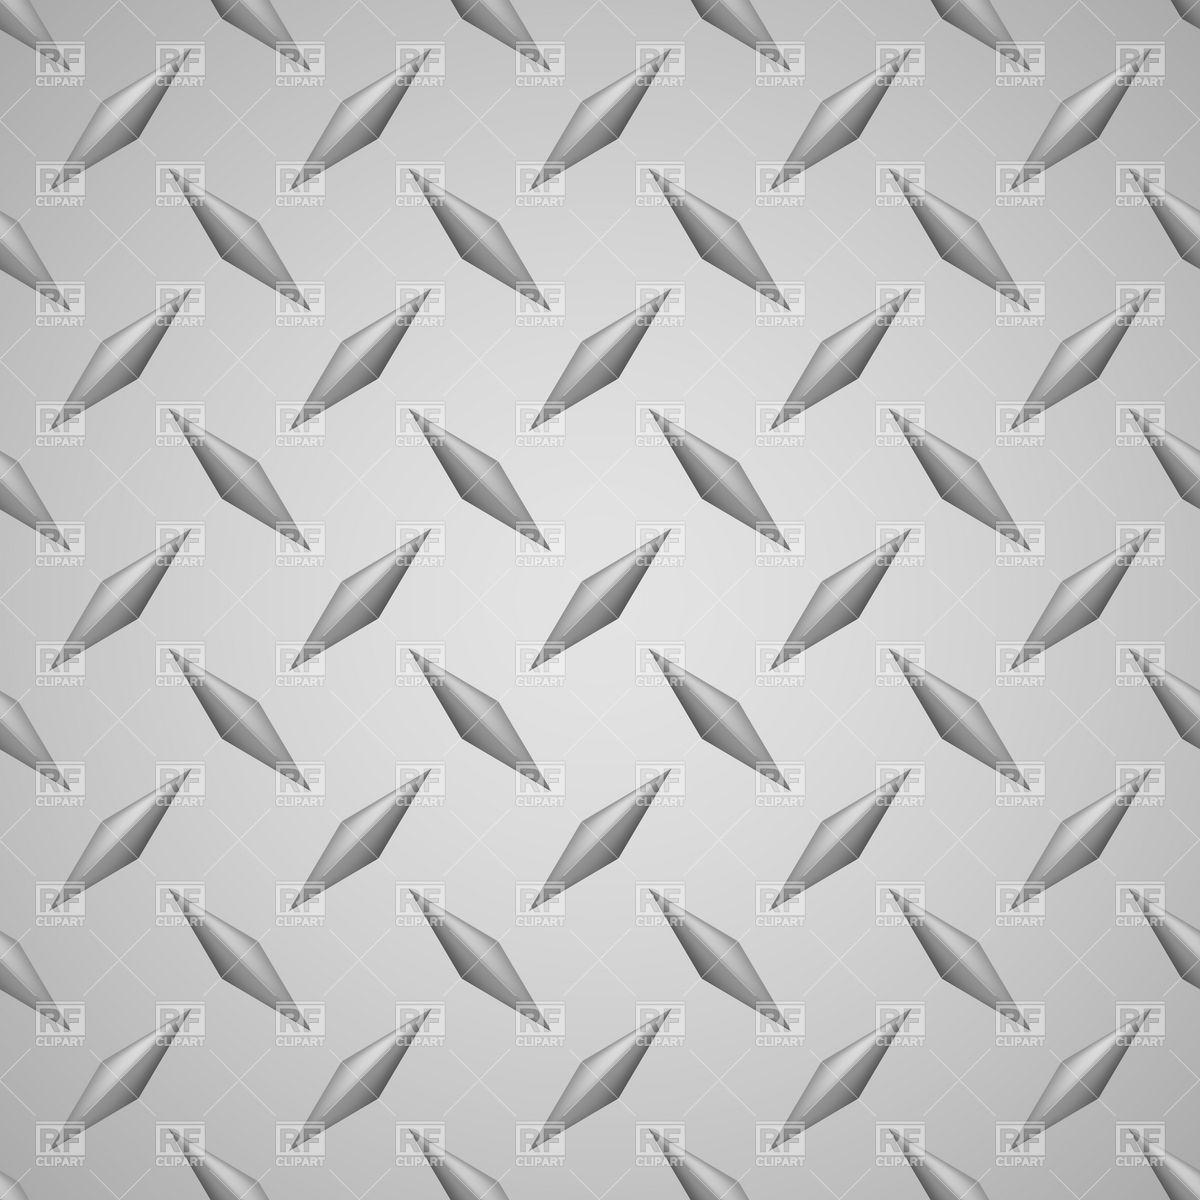 Texture Clipart - Clipart Kid